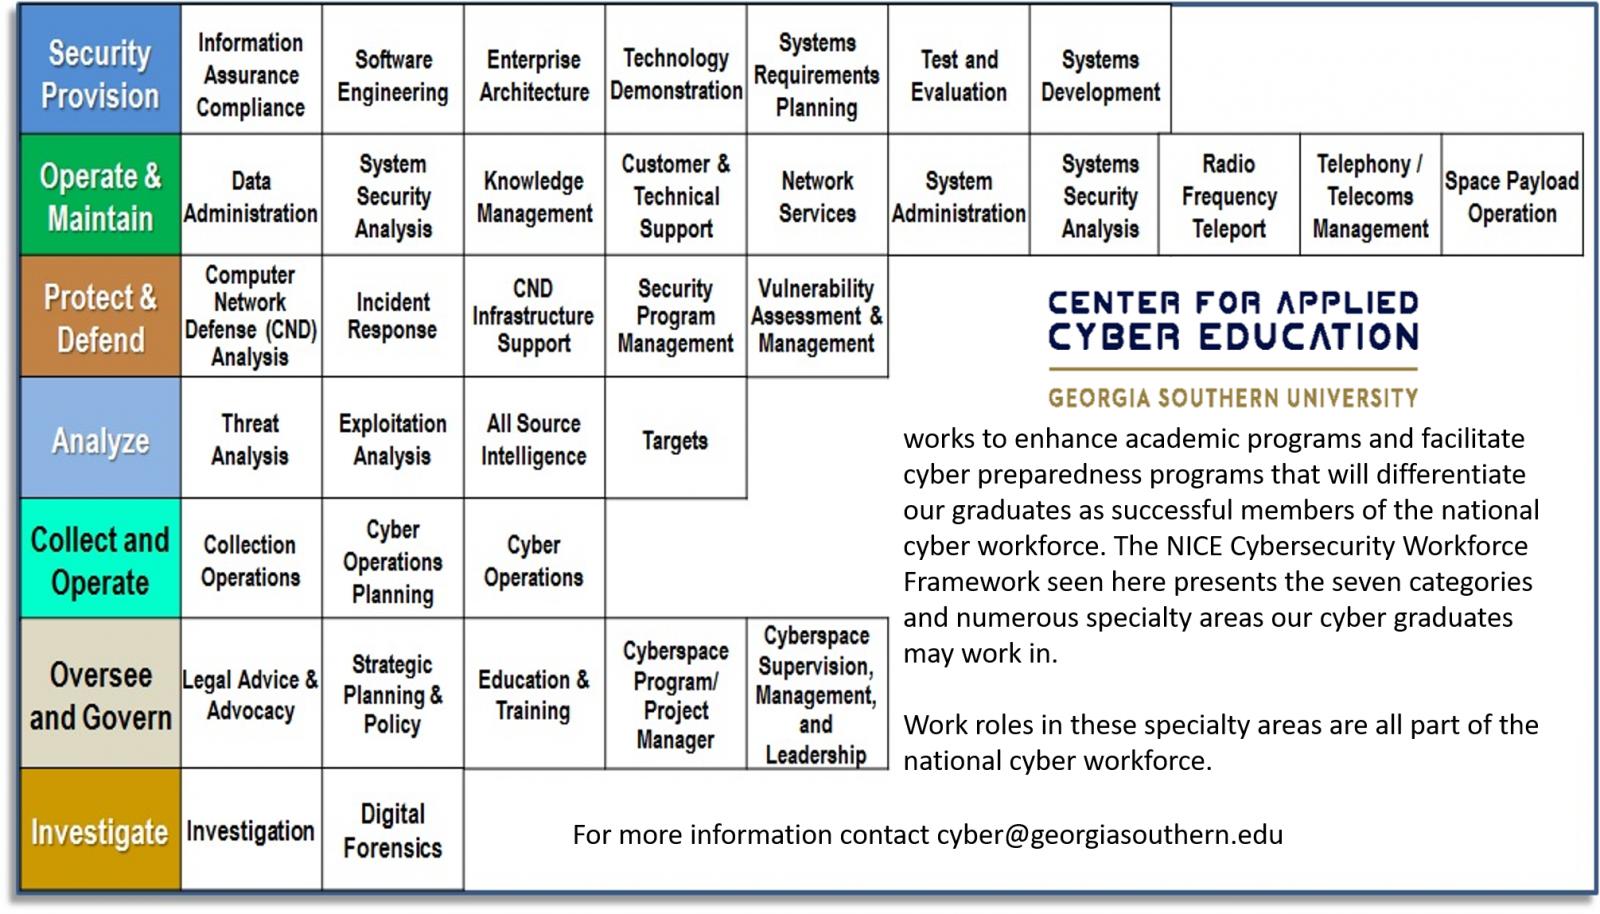 CACE Framework